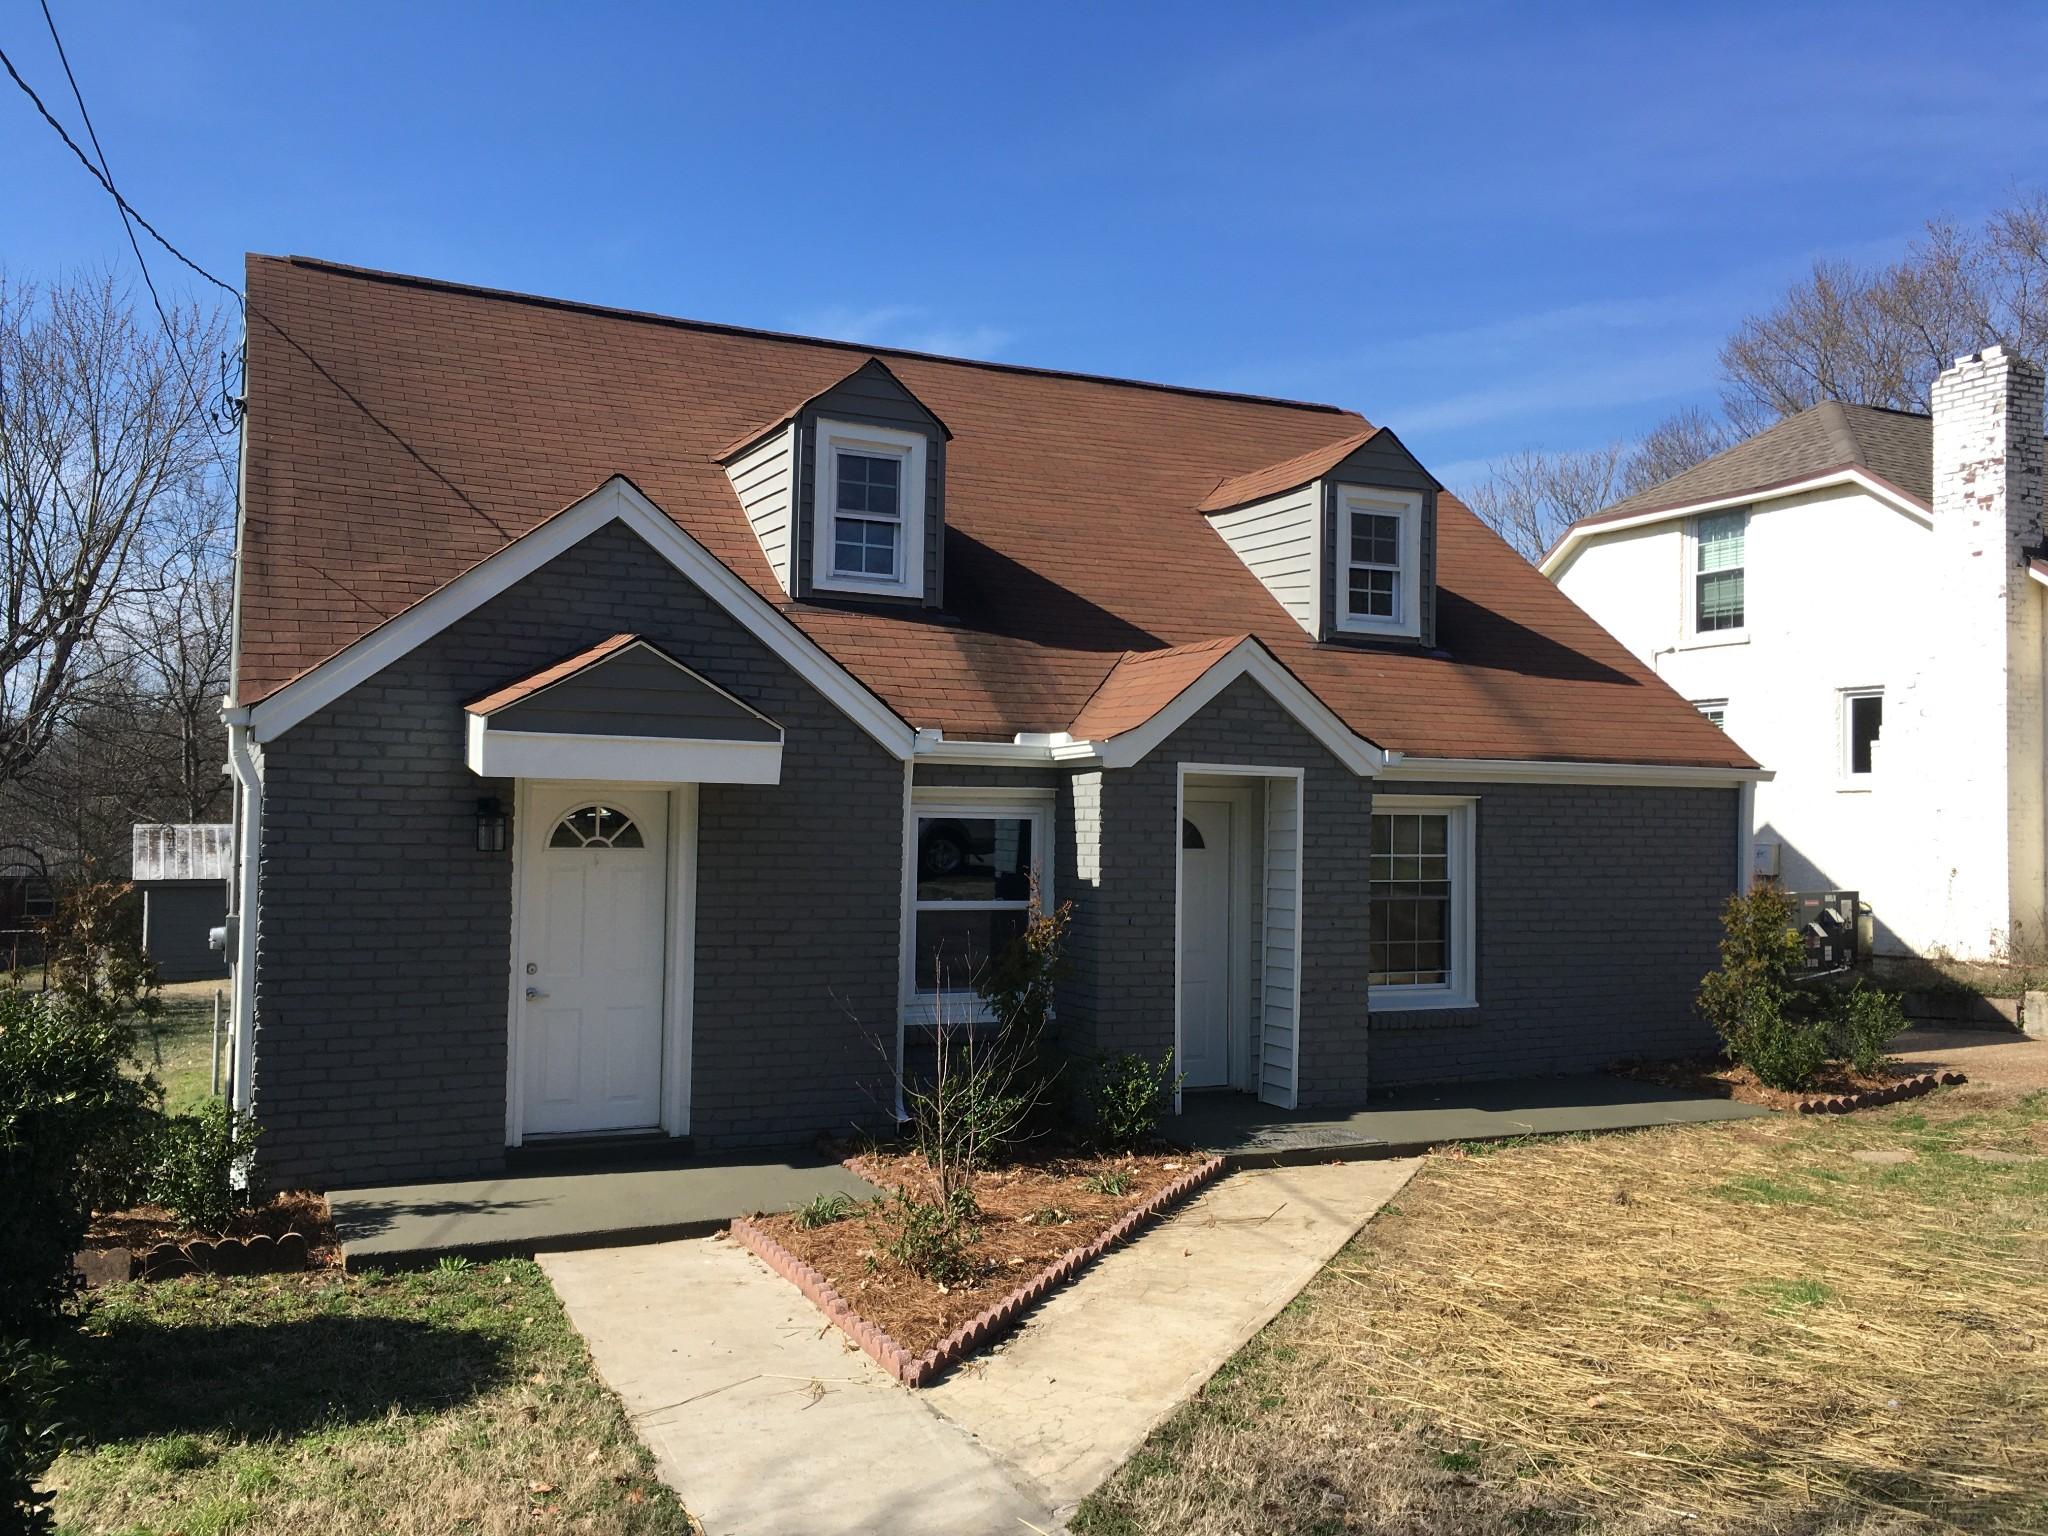 1410 Janie Ave, Nashville, TN 37216 - Nashville, TN real estate listing